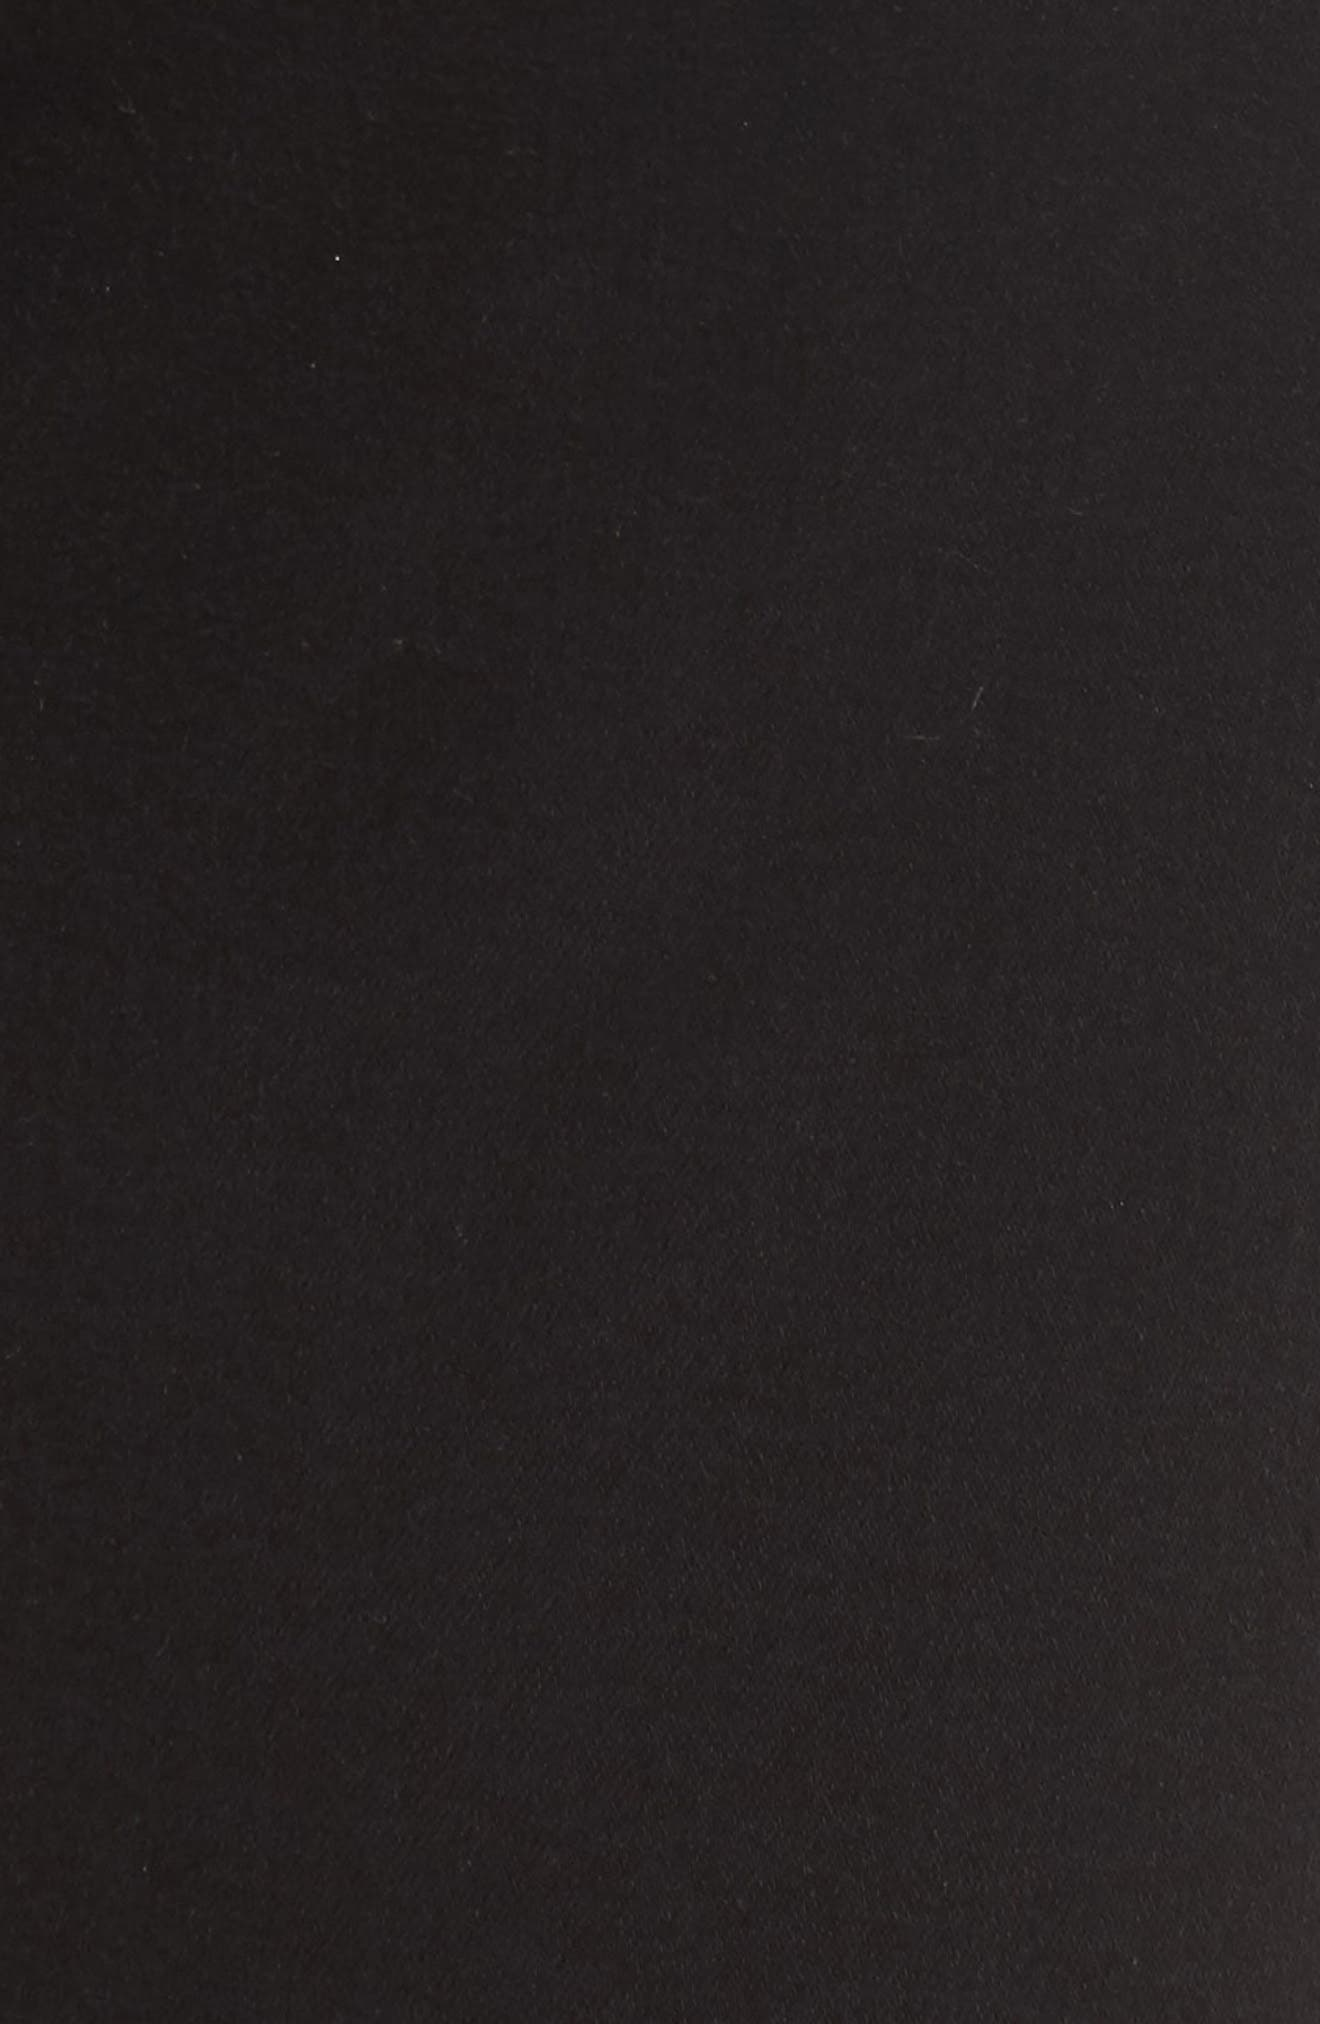 b(air) High Waist Skinny Jeans,                             Alternate thumbnail 6, color,                             B(AIR) BLACK